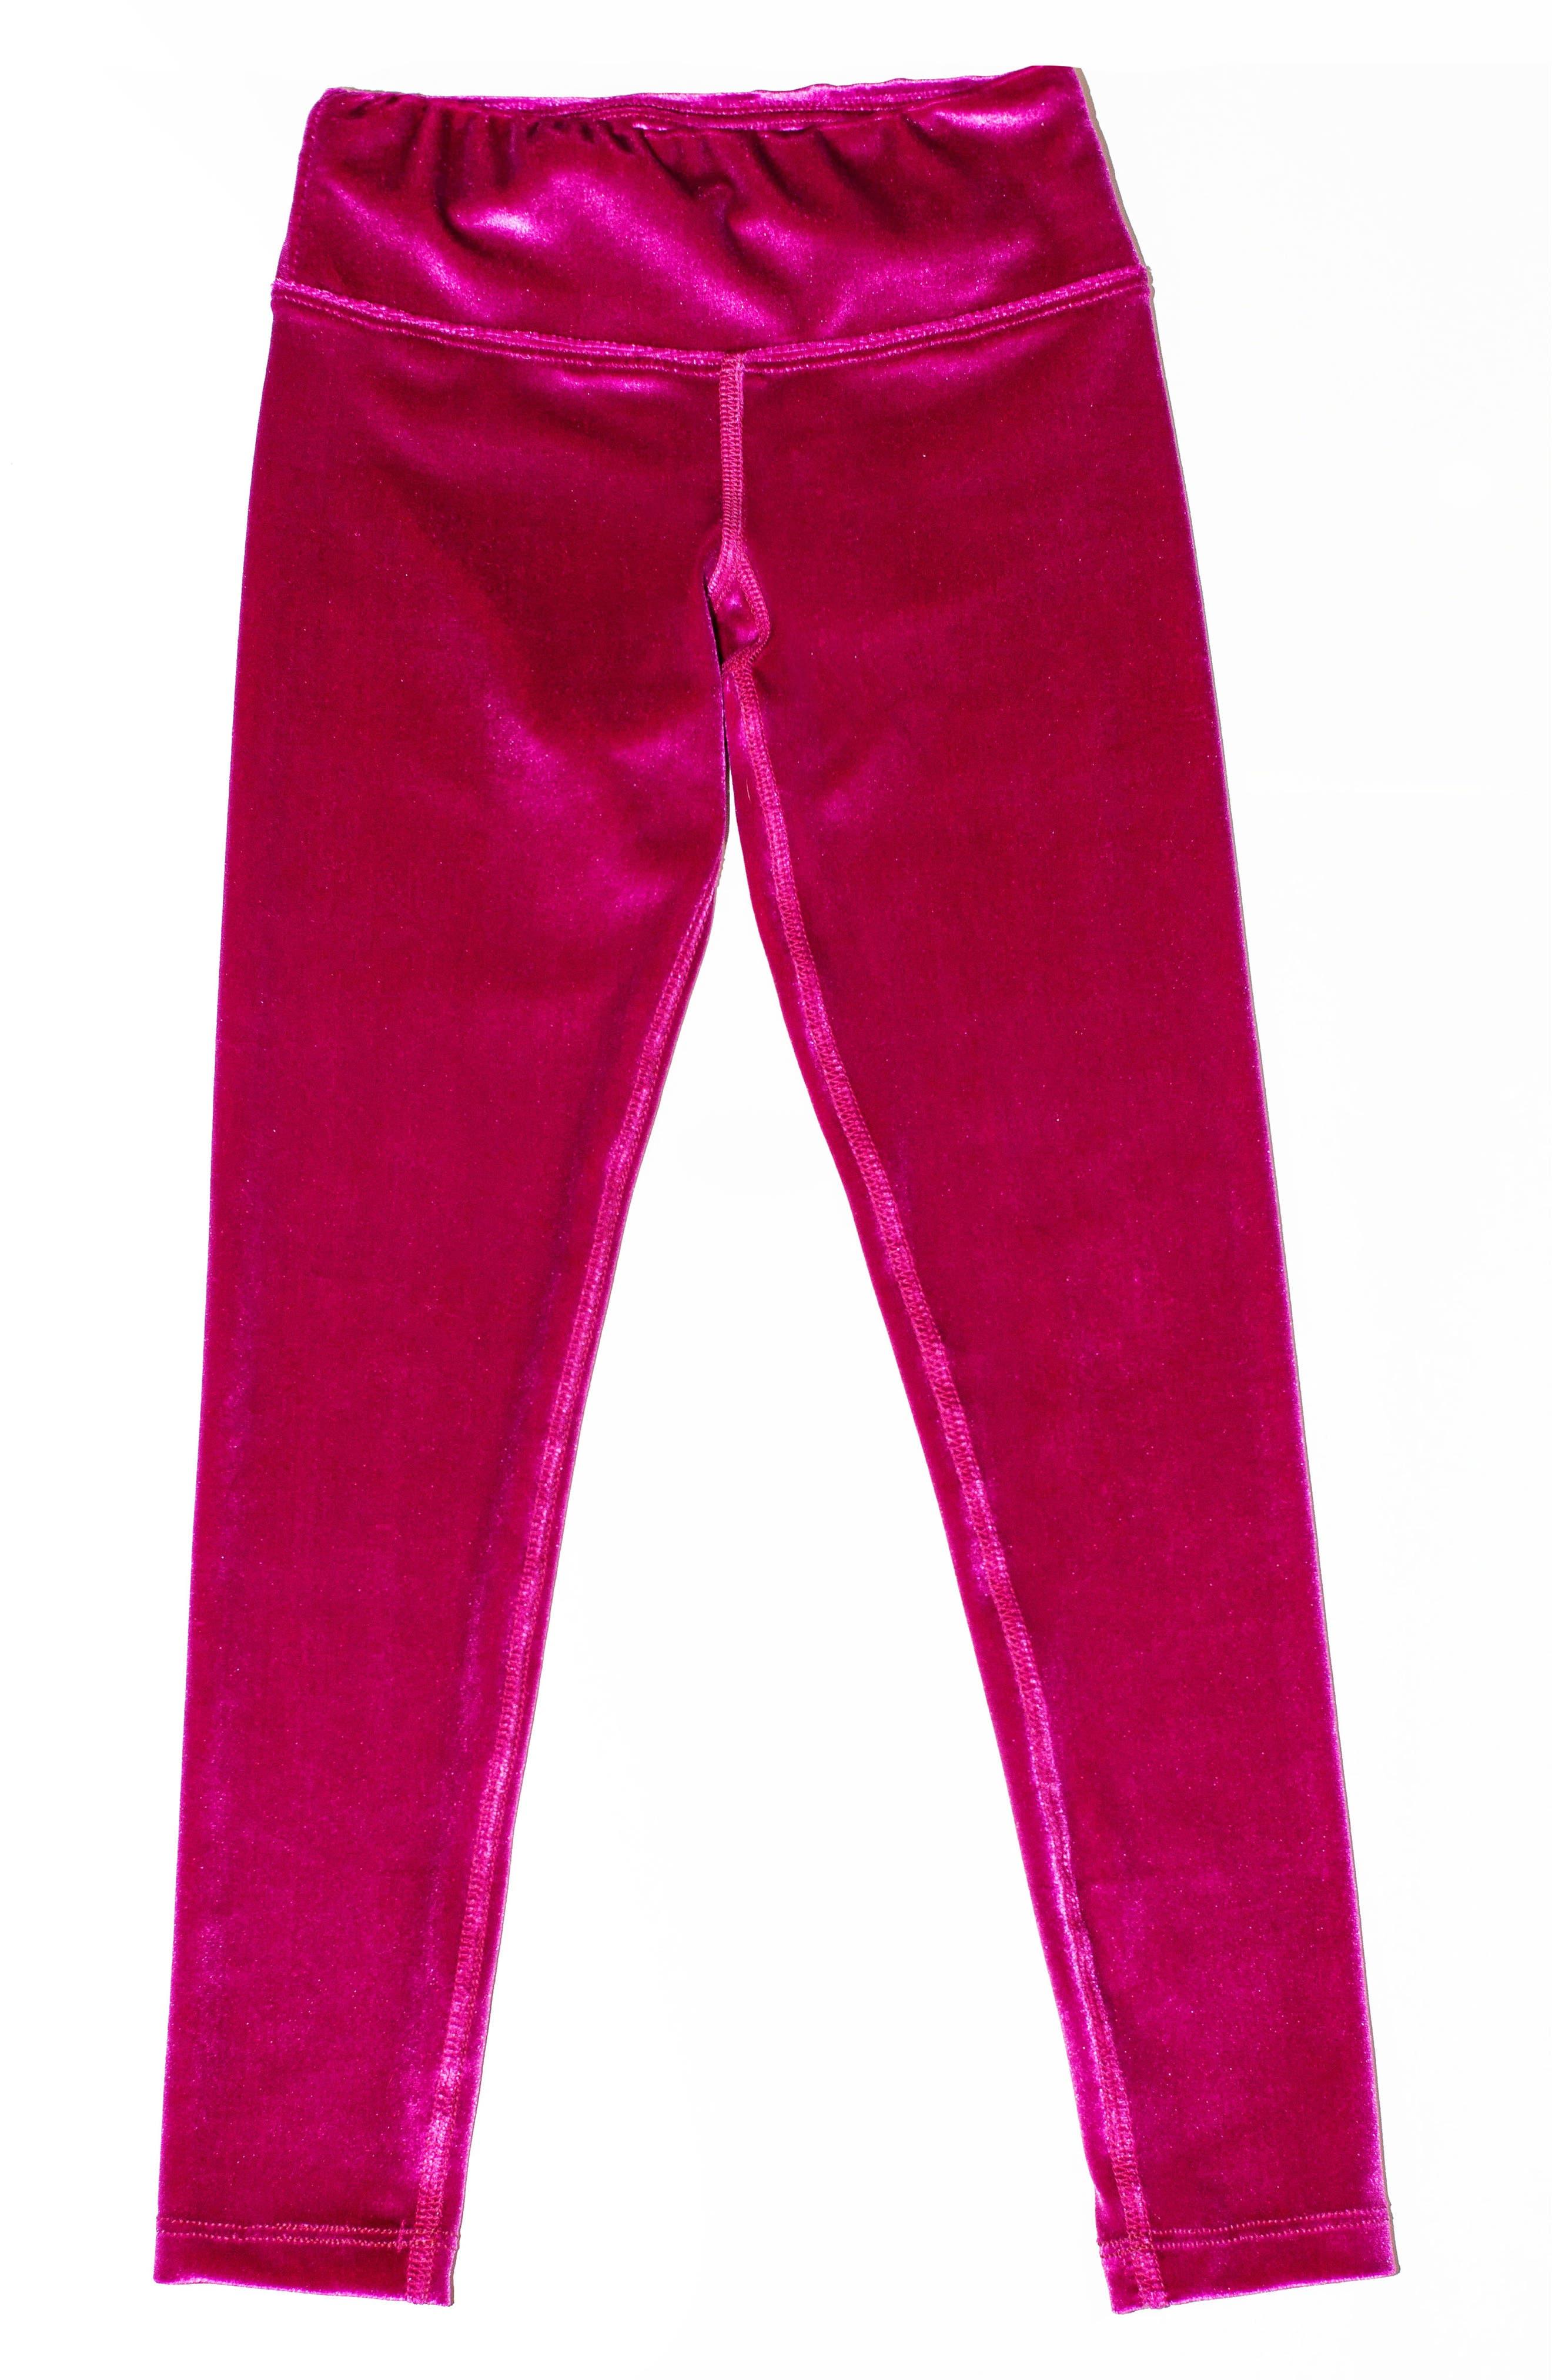 Velour Leggings,                         Main,                         color, Wild Rose